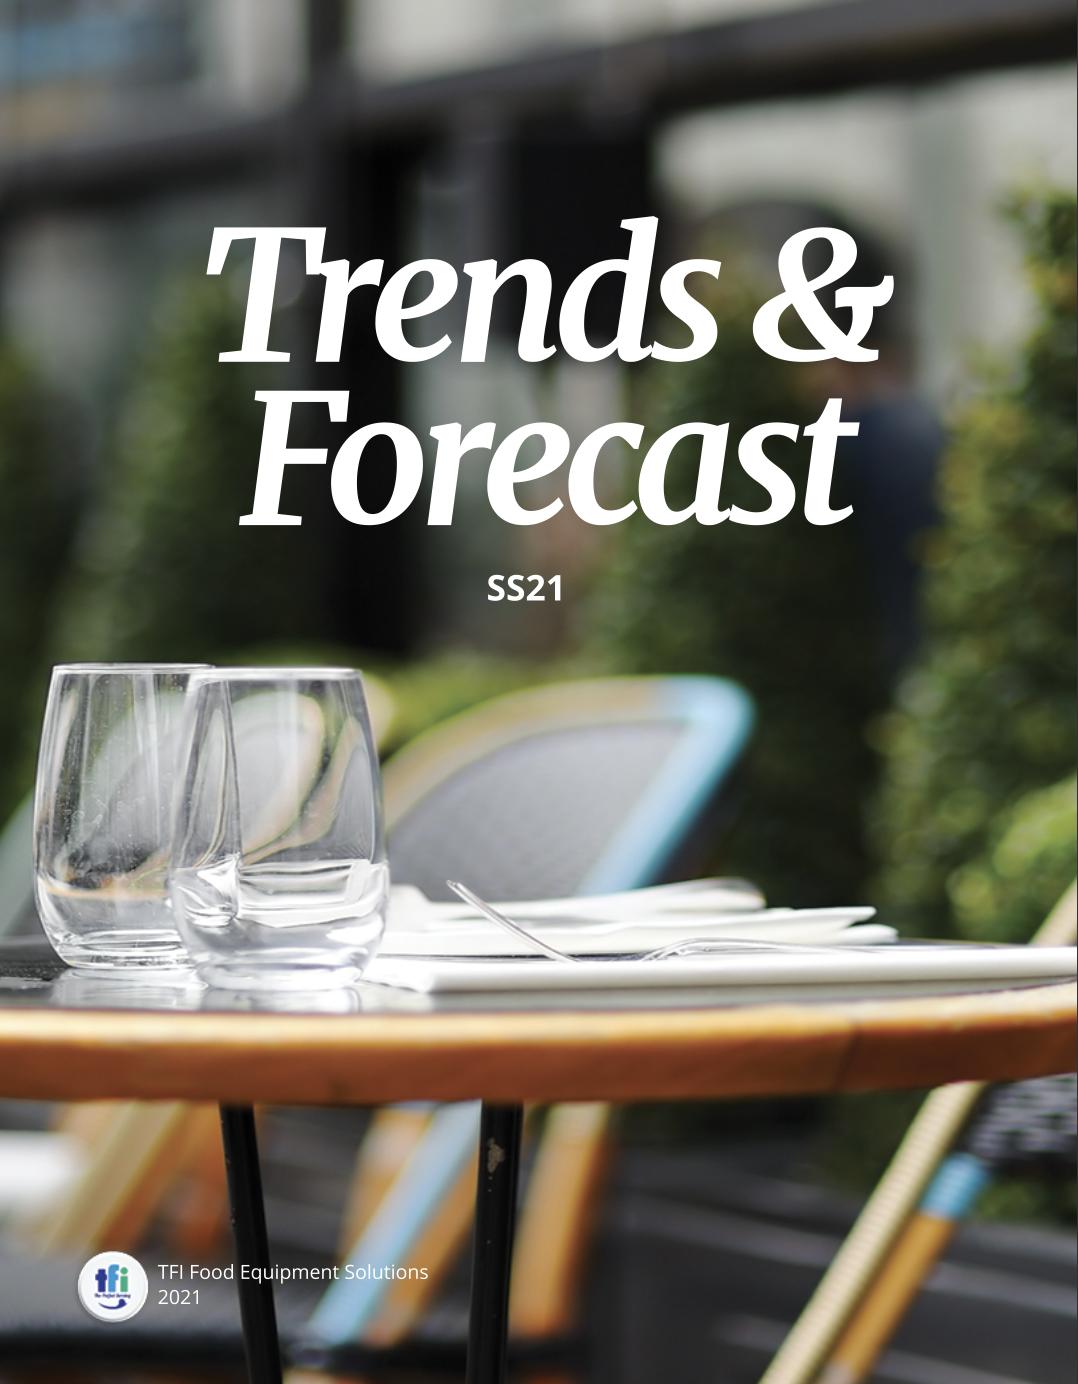 Trends & Forecast SS21